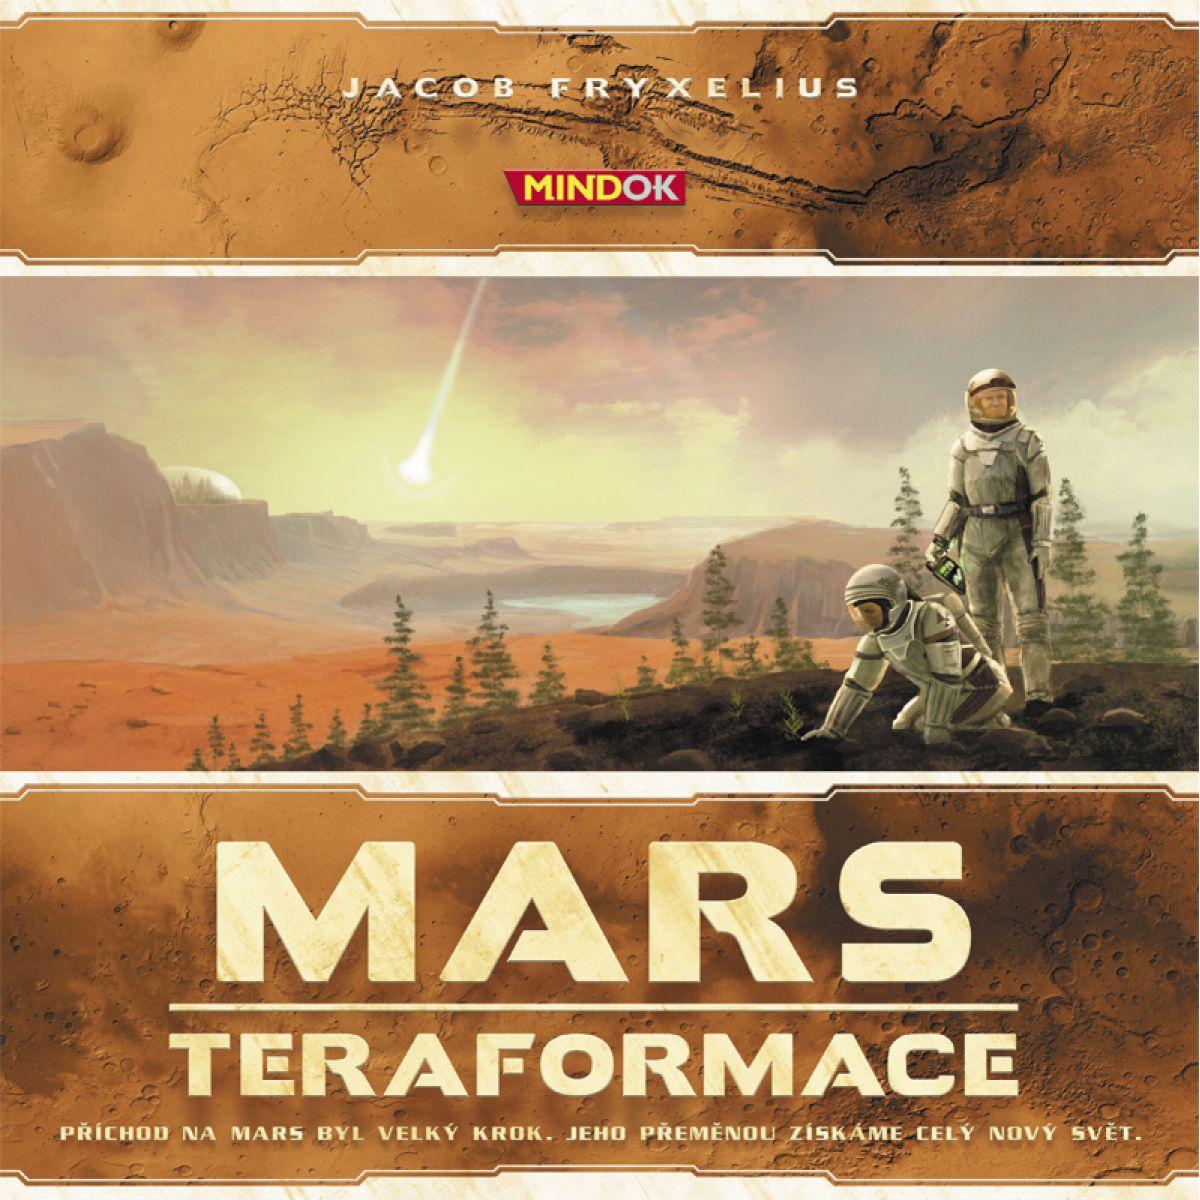 Mindok Mars: Teraformace